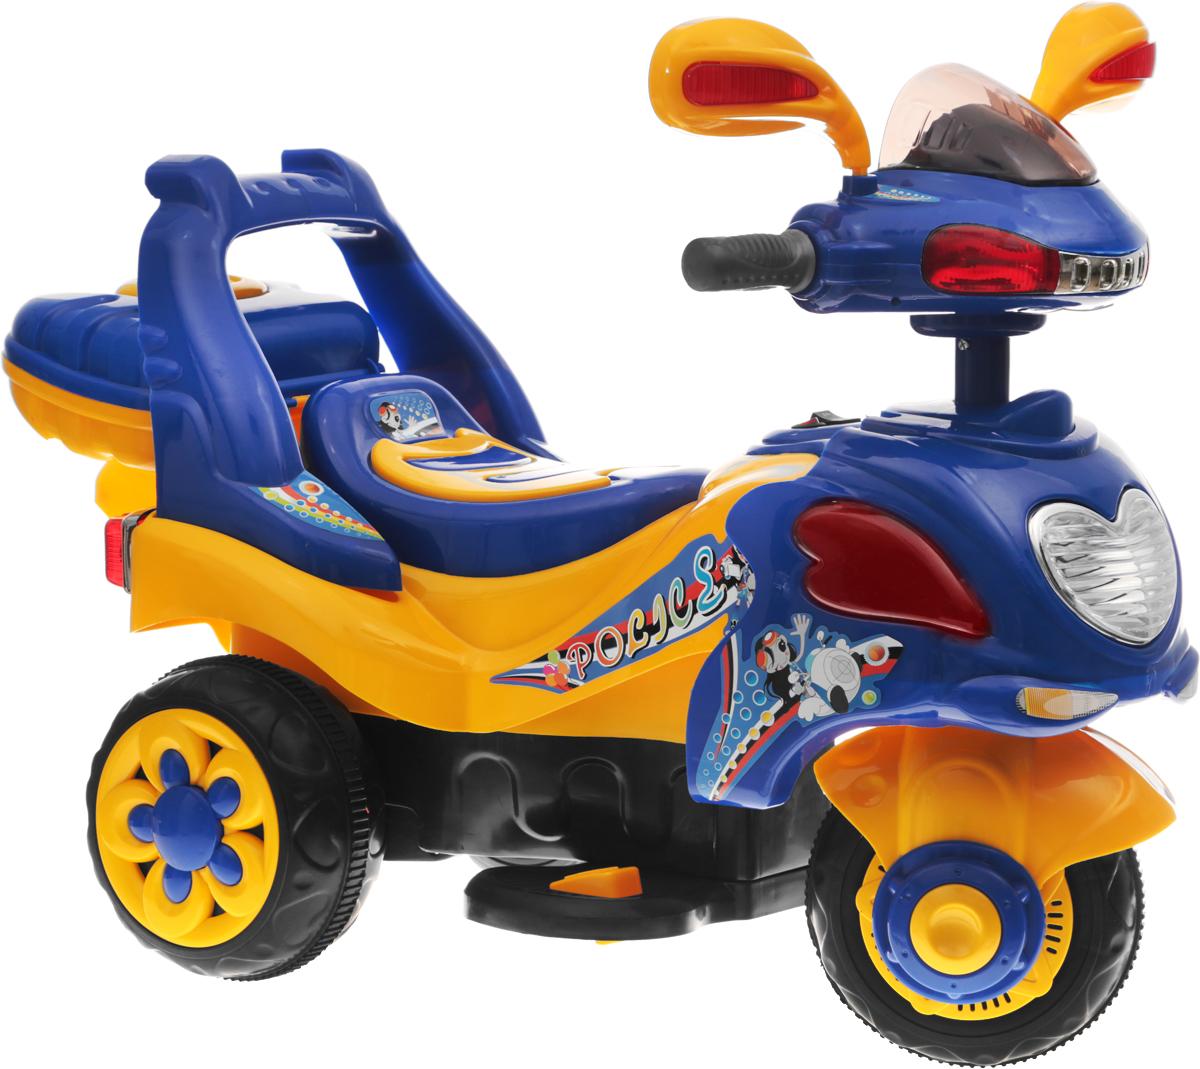 G120 Мотоцикл детский на аккумуляторе с багажником цвет синий - Электромобили